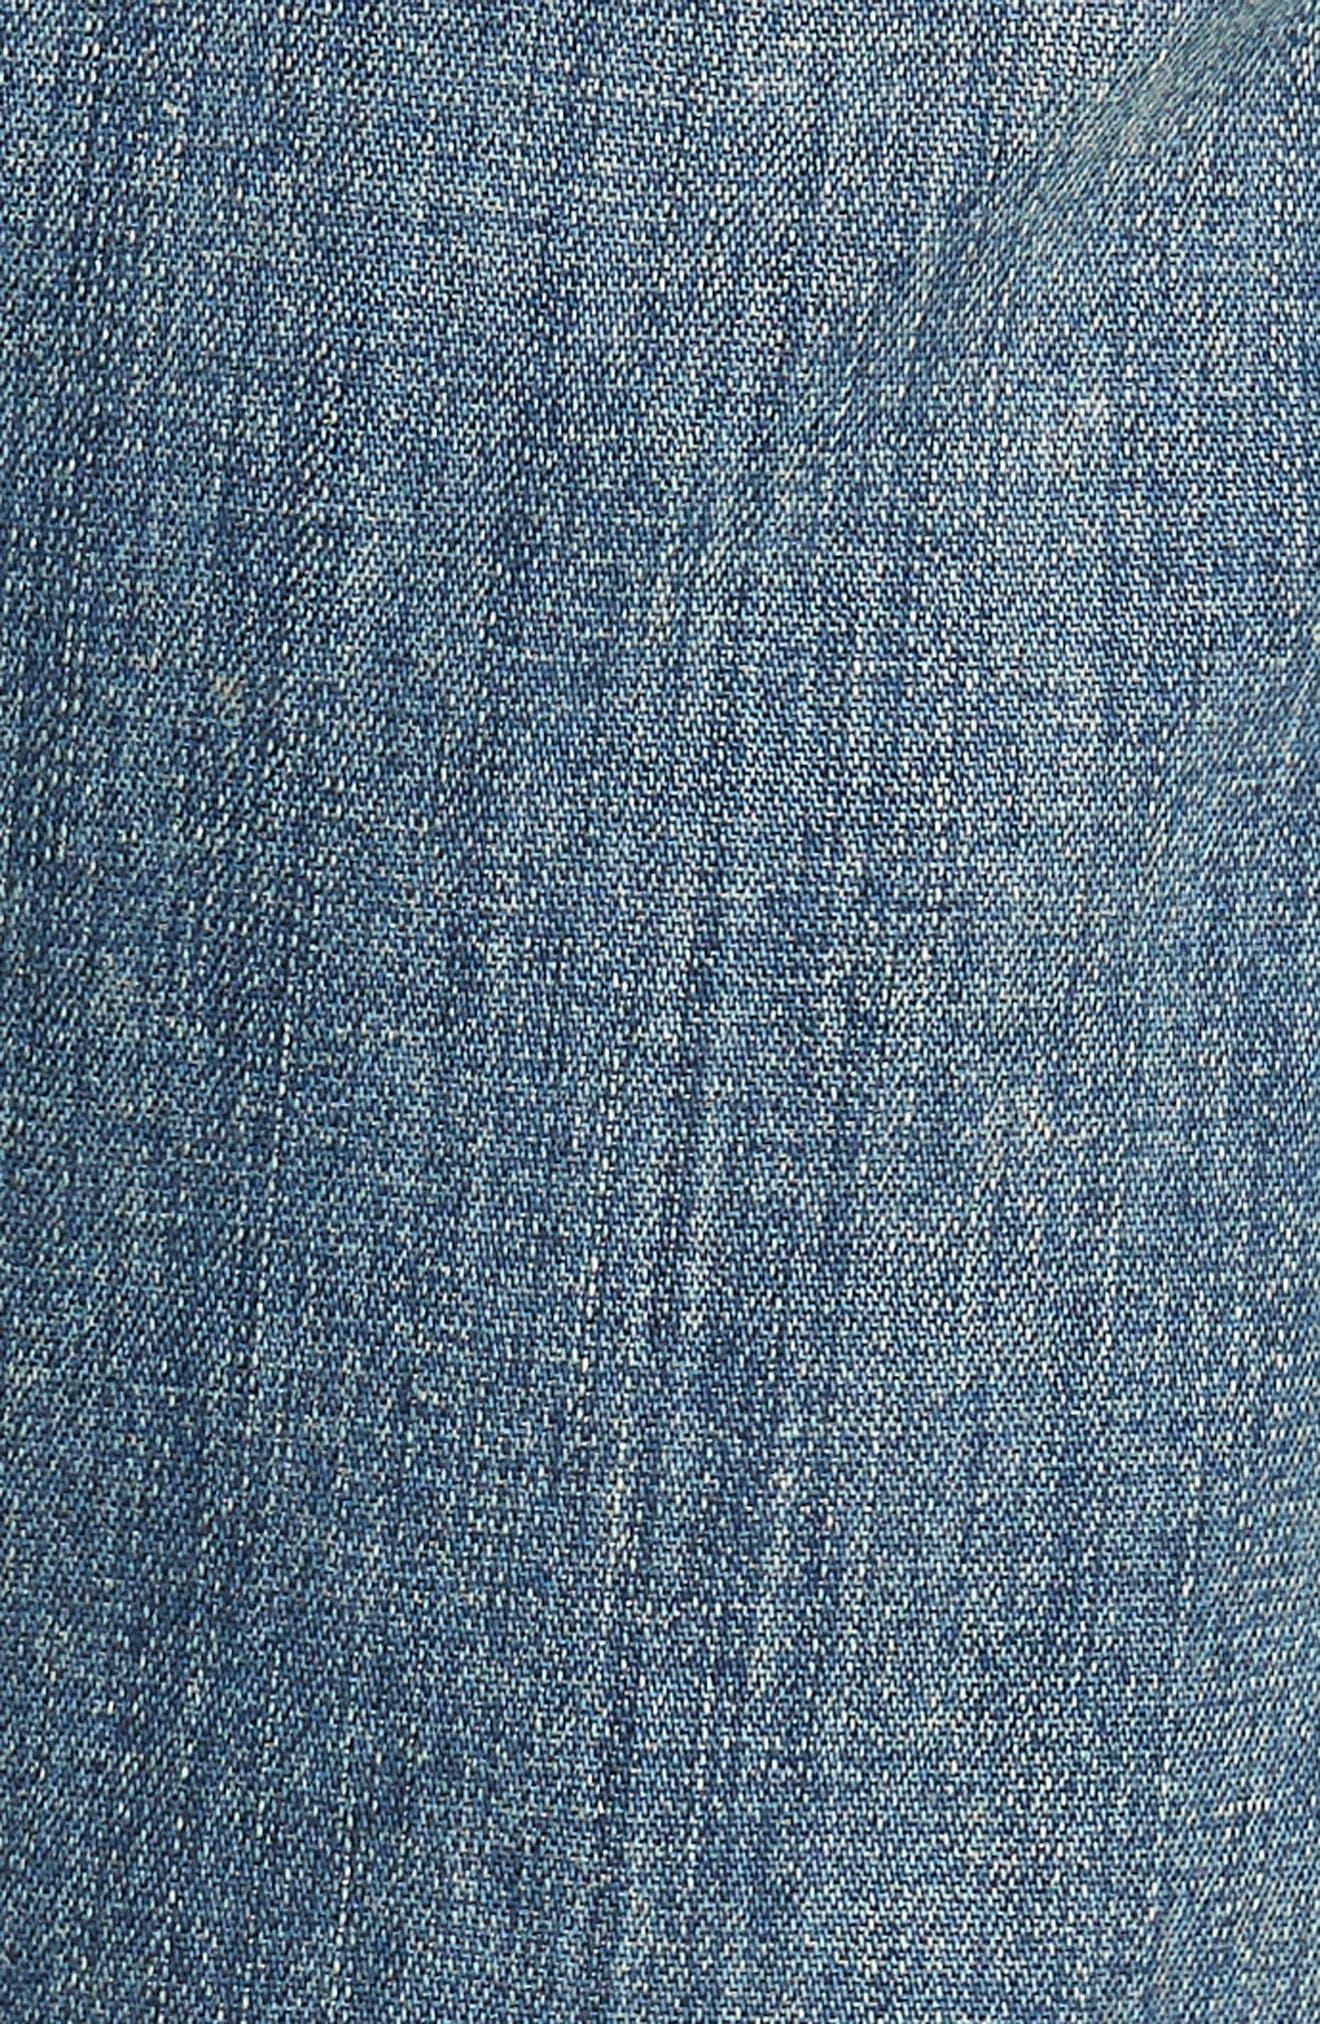 Gage Slim Straight Leg Jeans,                             Alternate thumbnail 5, color,                             464